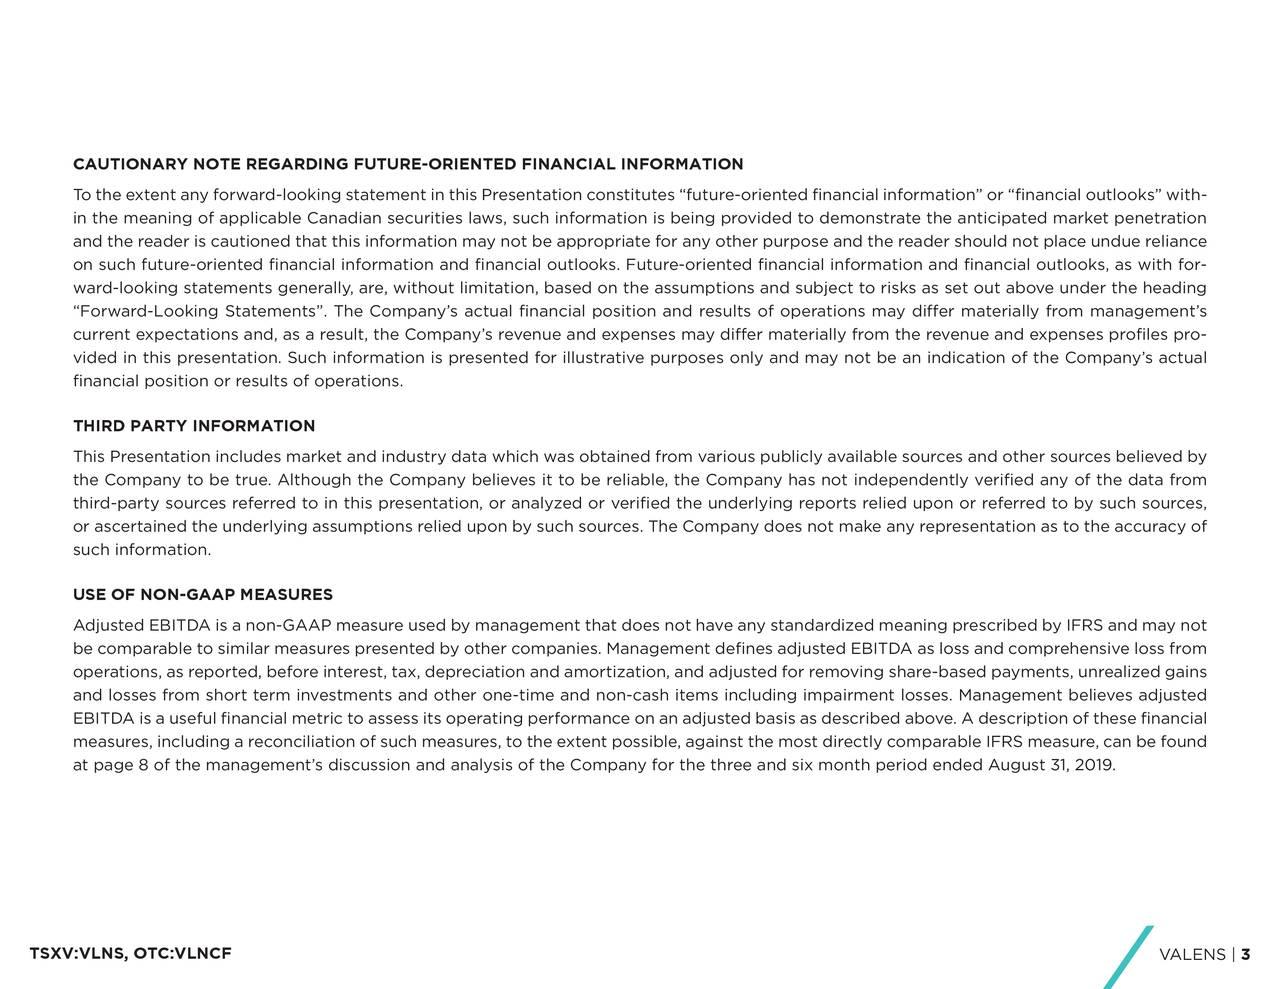 CAUTIONARY NOTE REGARDING FUTURE-ORIENTED FINANCIAL INFORMATION